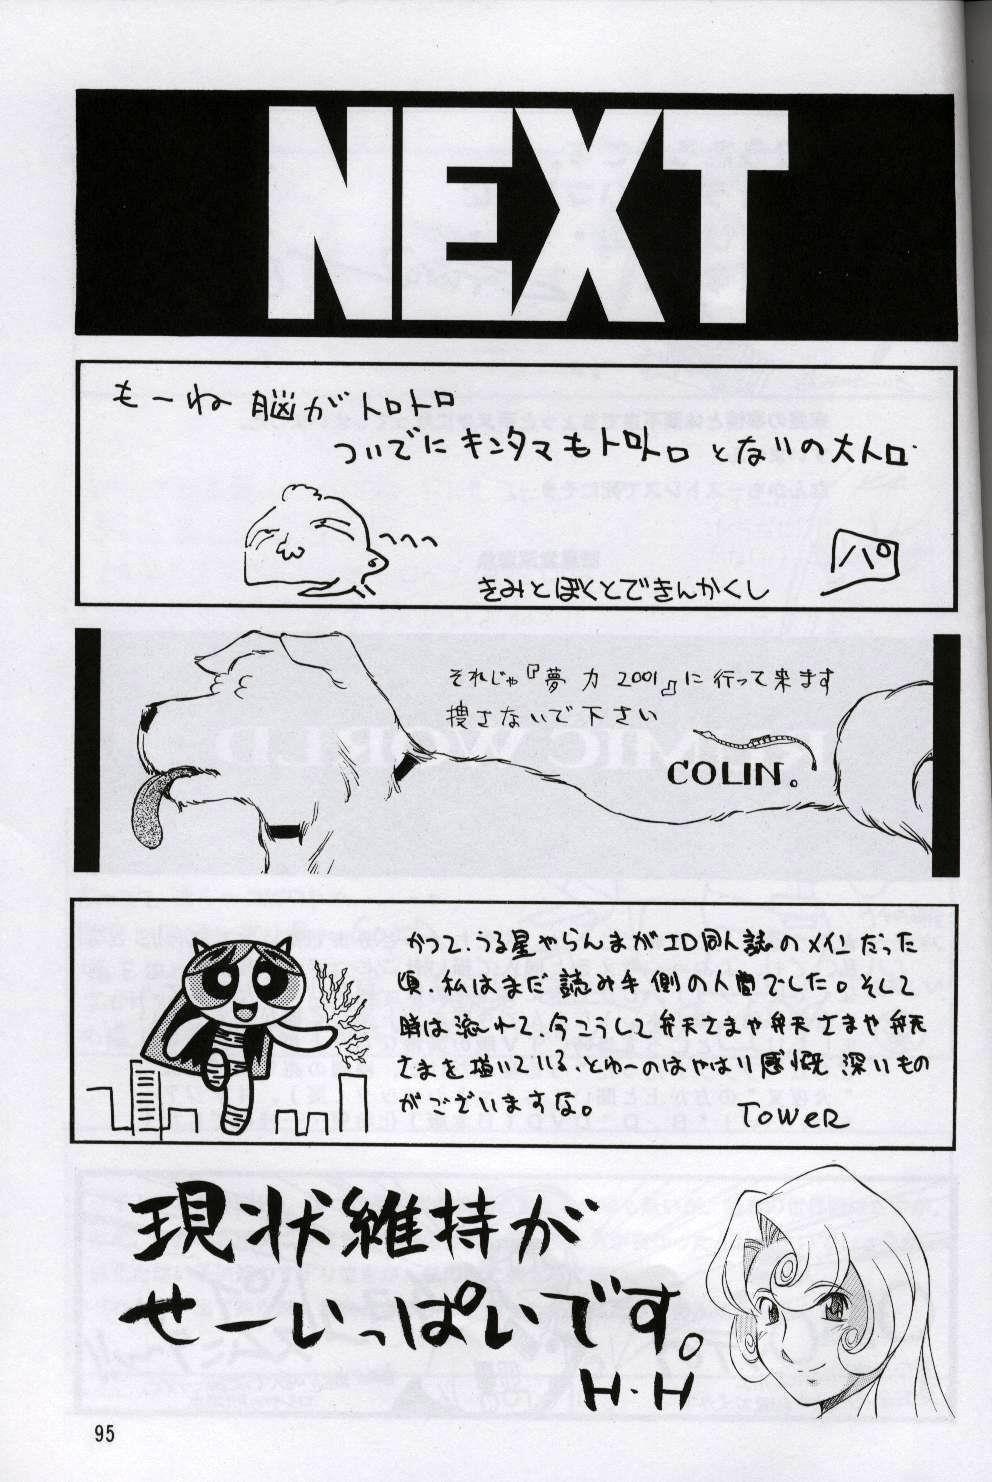 Next Climax Magazine 7 - Rumic World 93